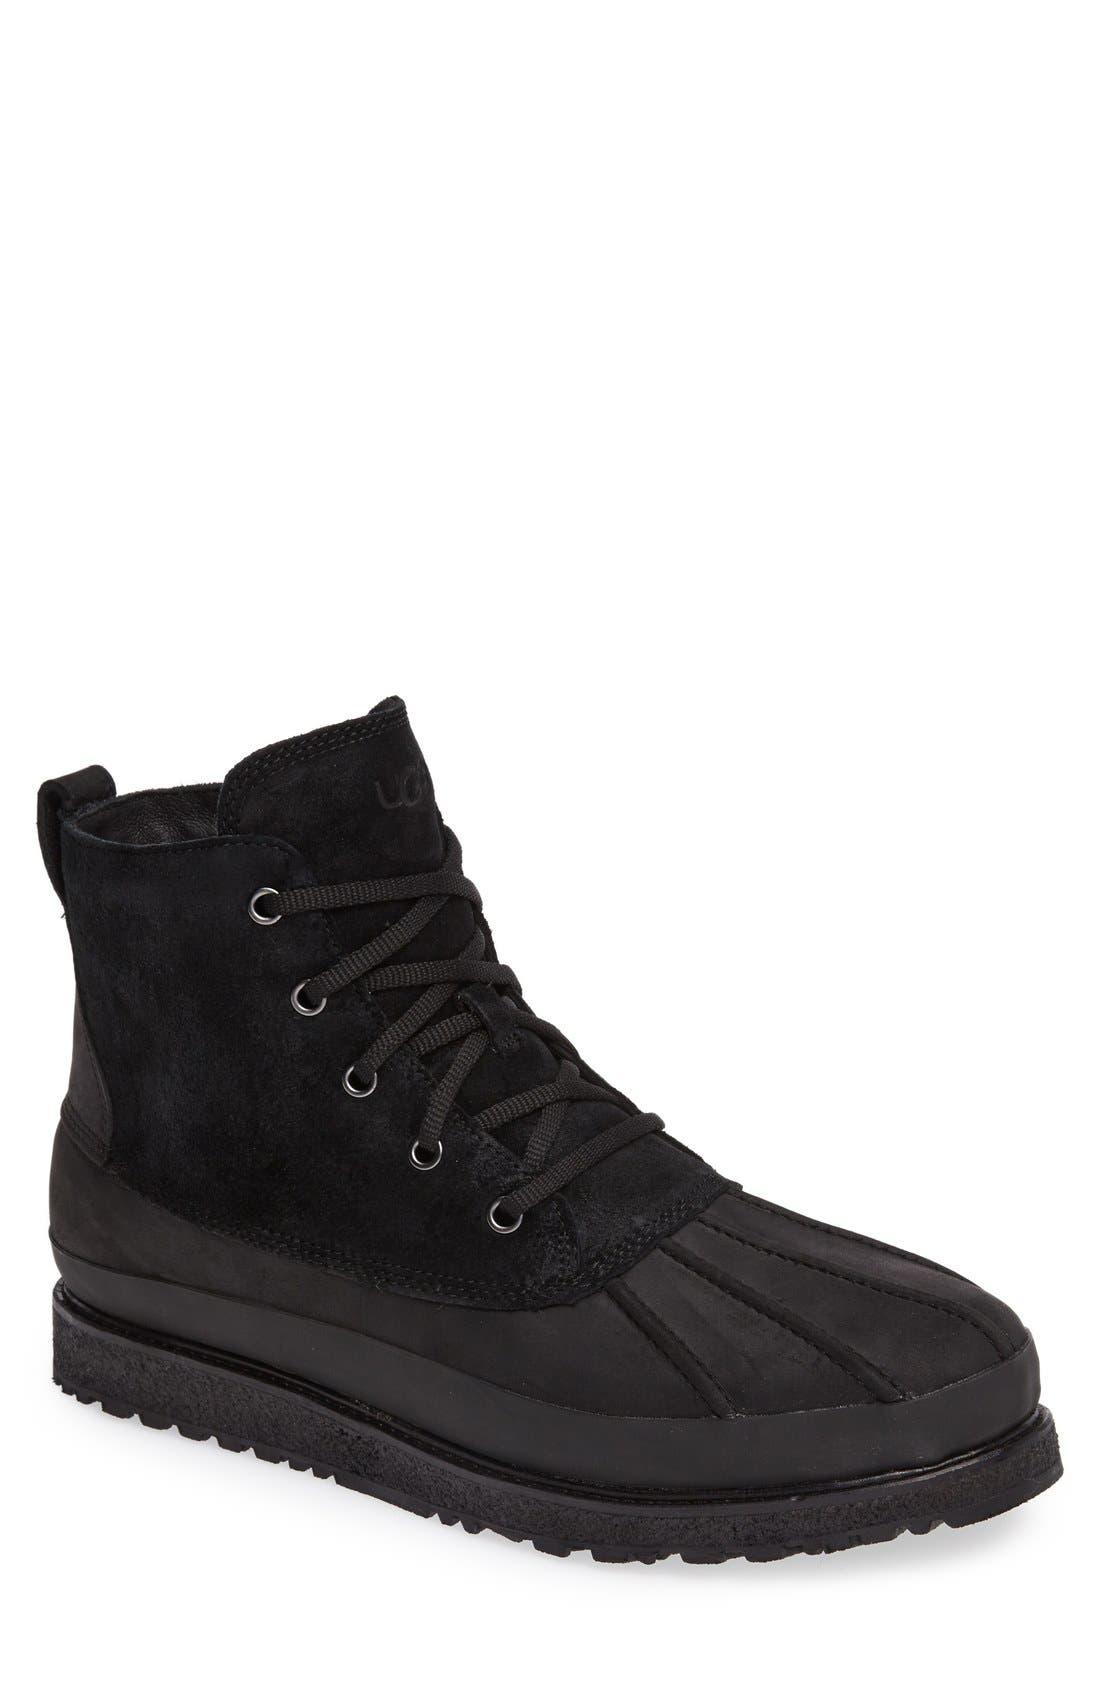 UGG<SUP>®</SUP> Fairbanks Waterproof Boot, Main, color, 001